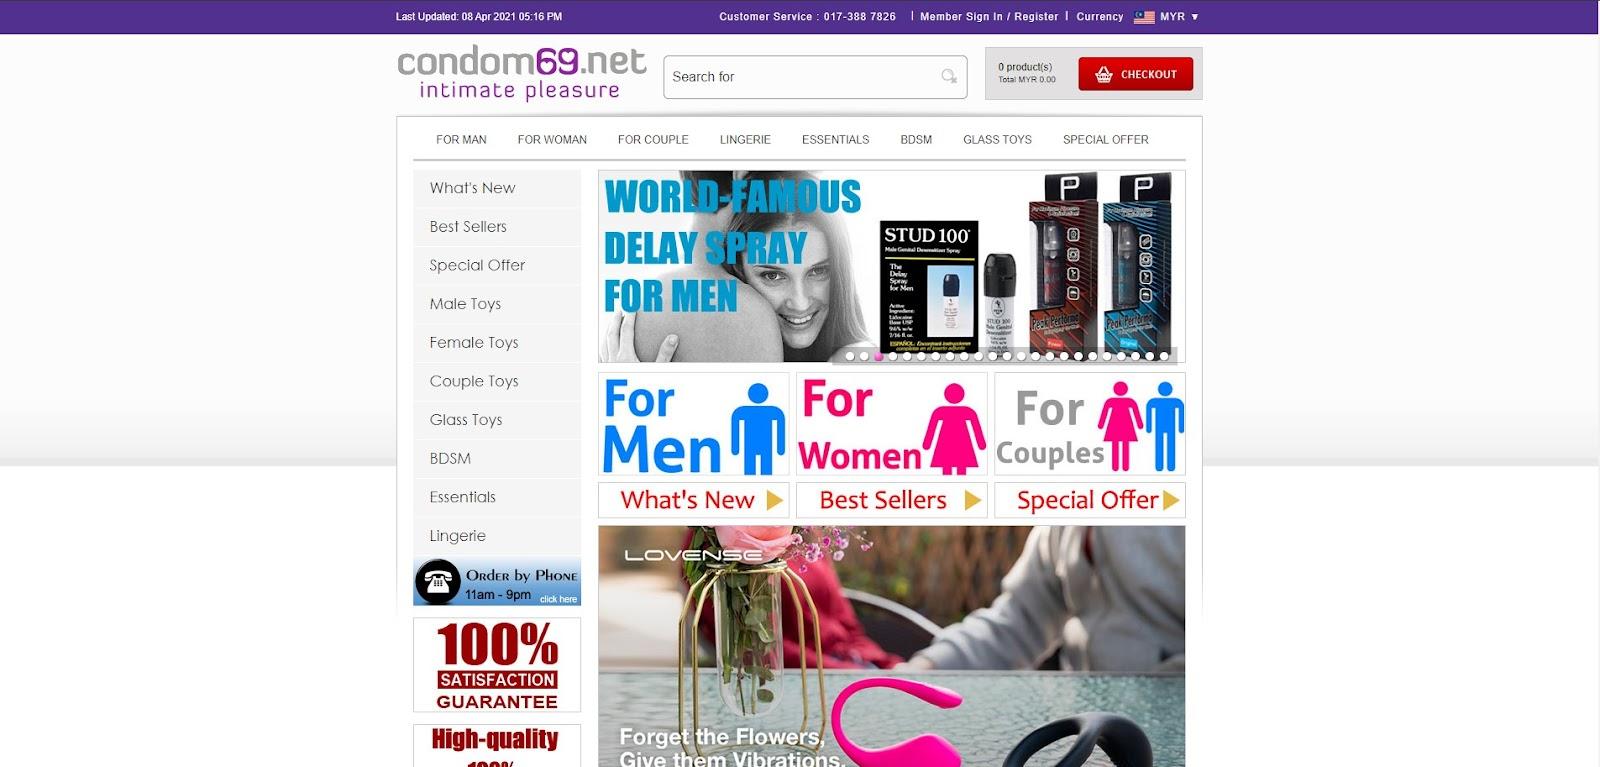 sex toys malaysia condom69